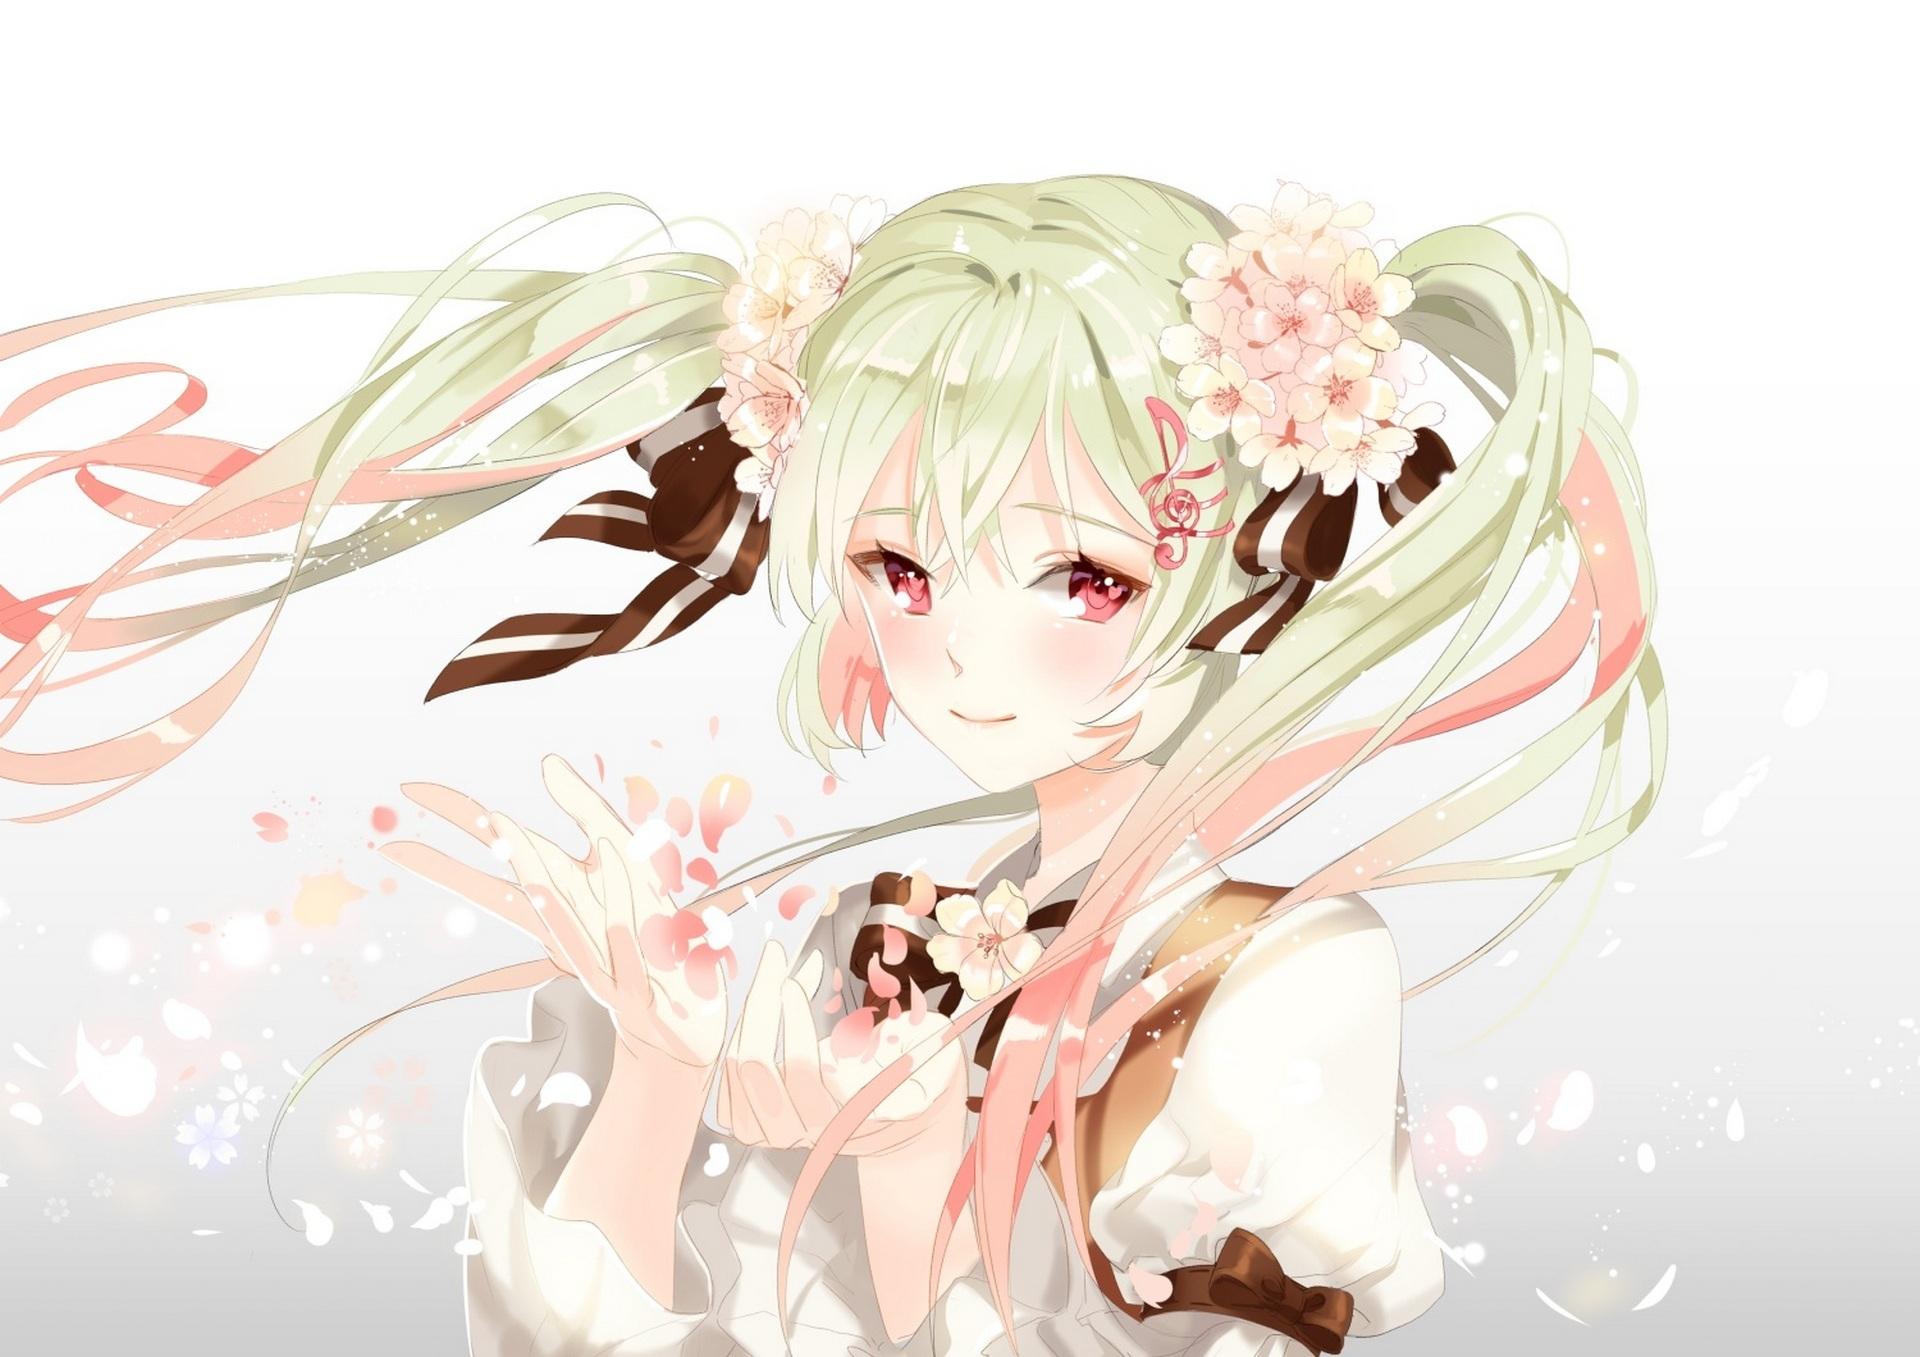 hinh nen anime girl dang yeu 78